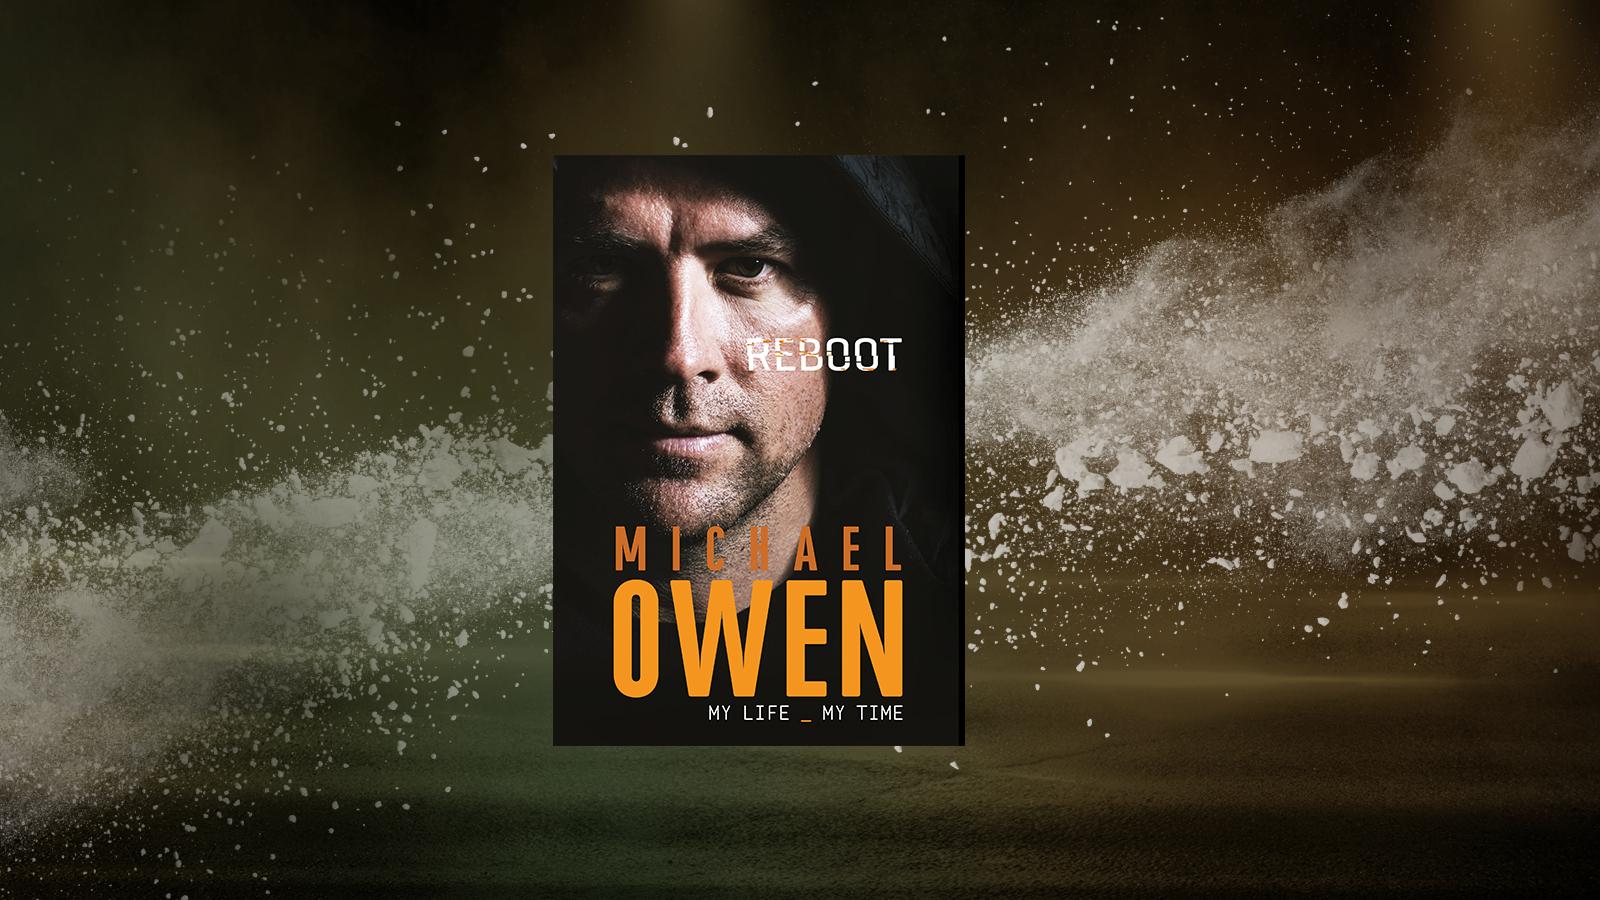 Interview with Mark Eglinton, Ghostwriter of Michael Owen's Autobiography 'Reboot'